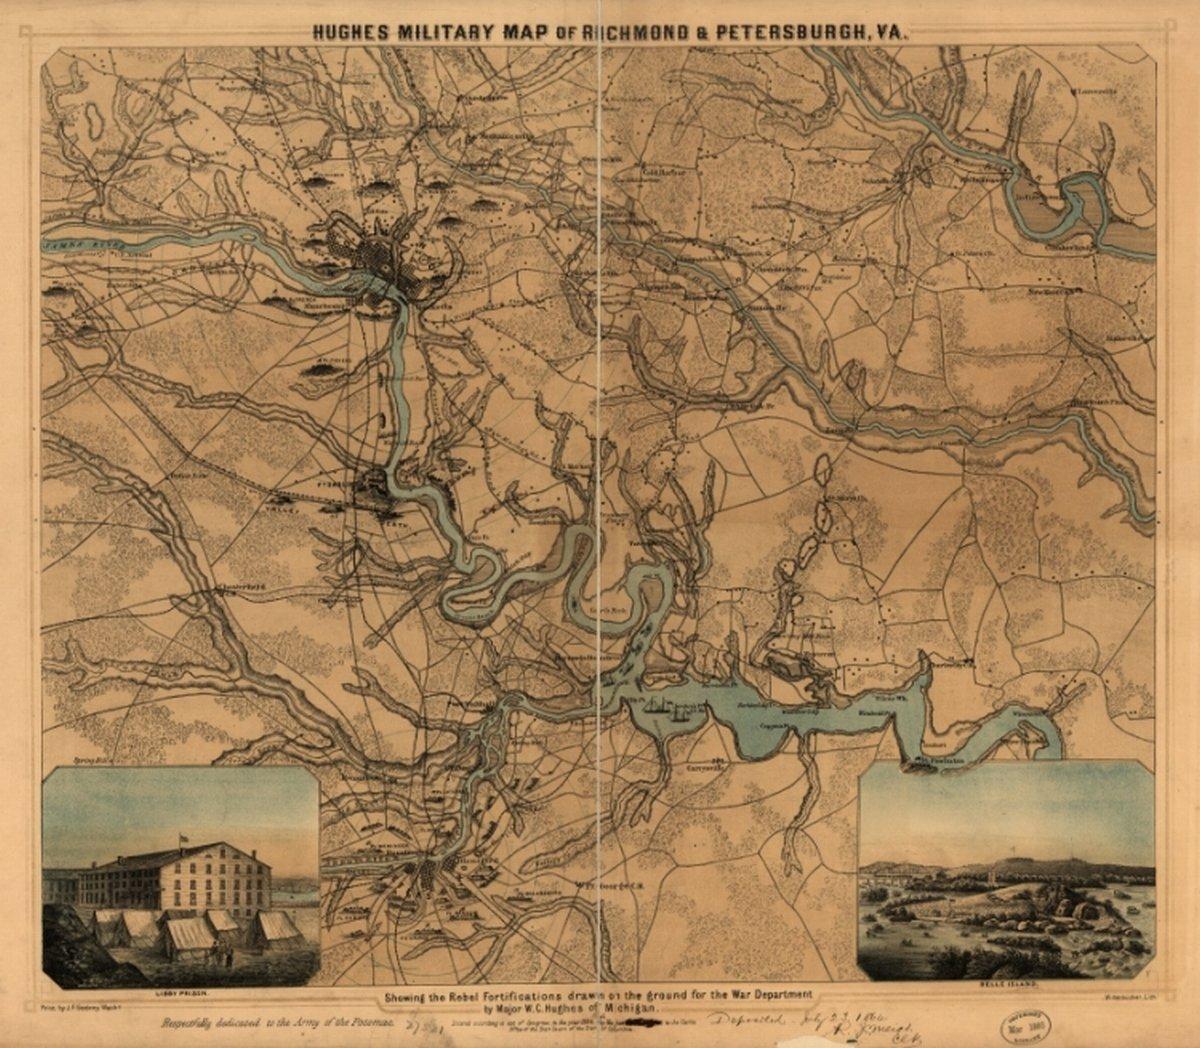 Amazon.com: c1864 Civil War map: Richmond Region Virginia ... on georgia virginia map, colonial virginia map, fredericksburg va map, central virginia state map, county of va counties map, virginia meissner trail map, columbia gas of virginia map, slavery in 1860 virginia map, united states virginia map, battle of chancellorsville virginia map, american flag virginia map, manakin town virginia map, battle of richmond virginia map, california virginia map, 5 regions virginia map, petersburg virginia state map, hwy 58 virginia map, powell river virginia map, aquia creek virginia map, new york virginia map,